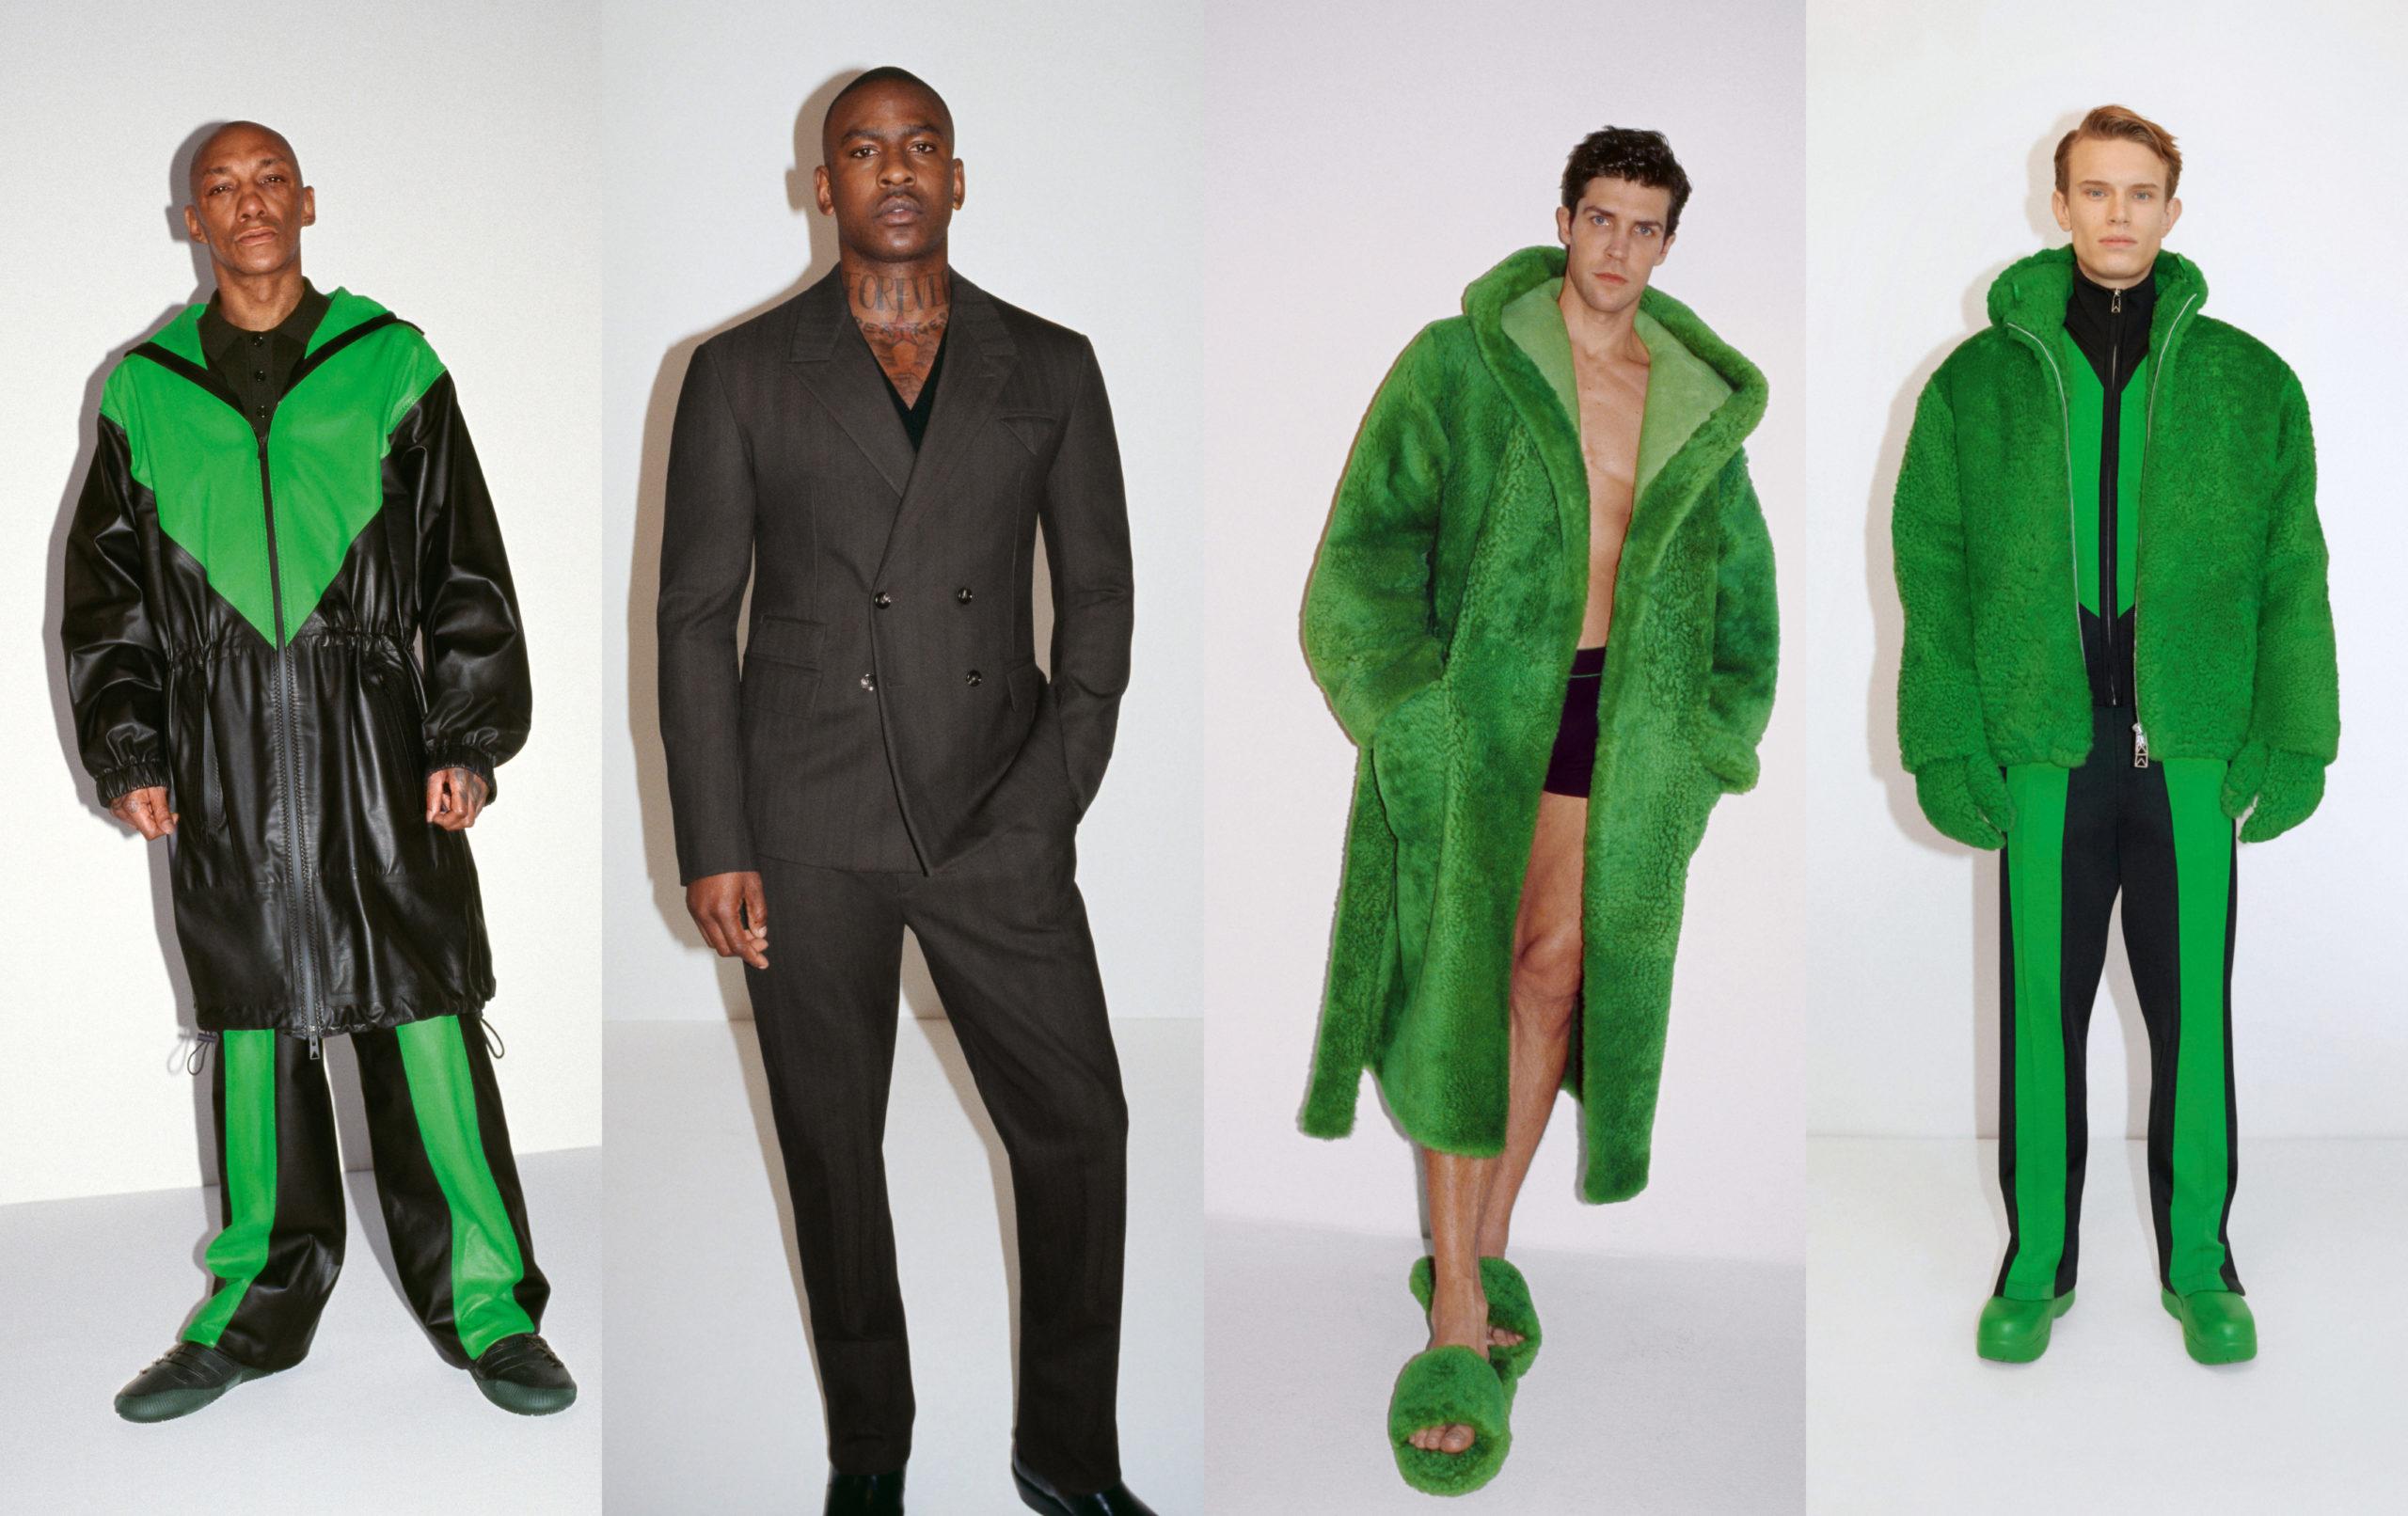 Bottega Venetta launches its Wardrobe 02 Collection